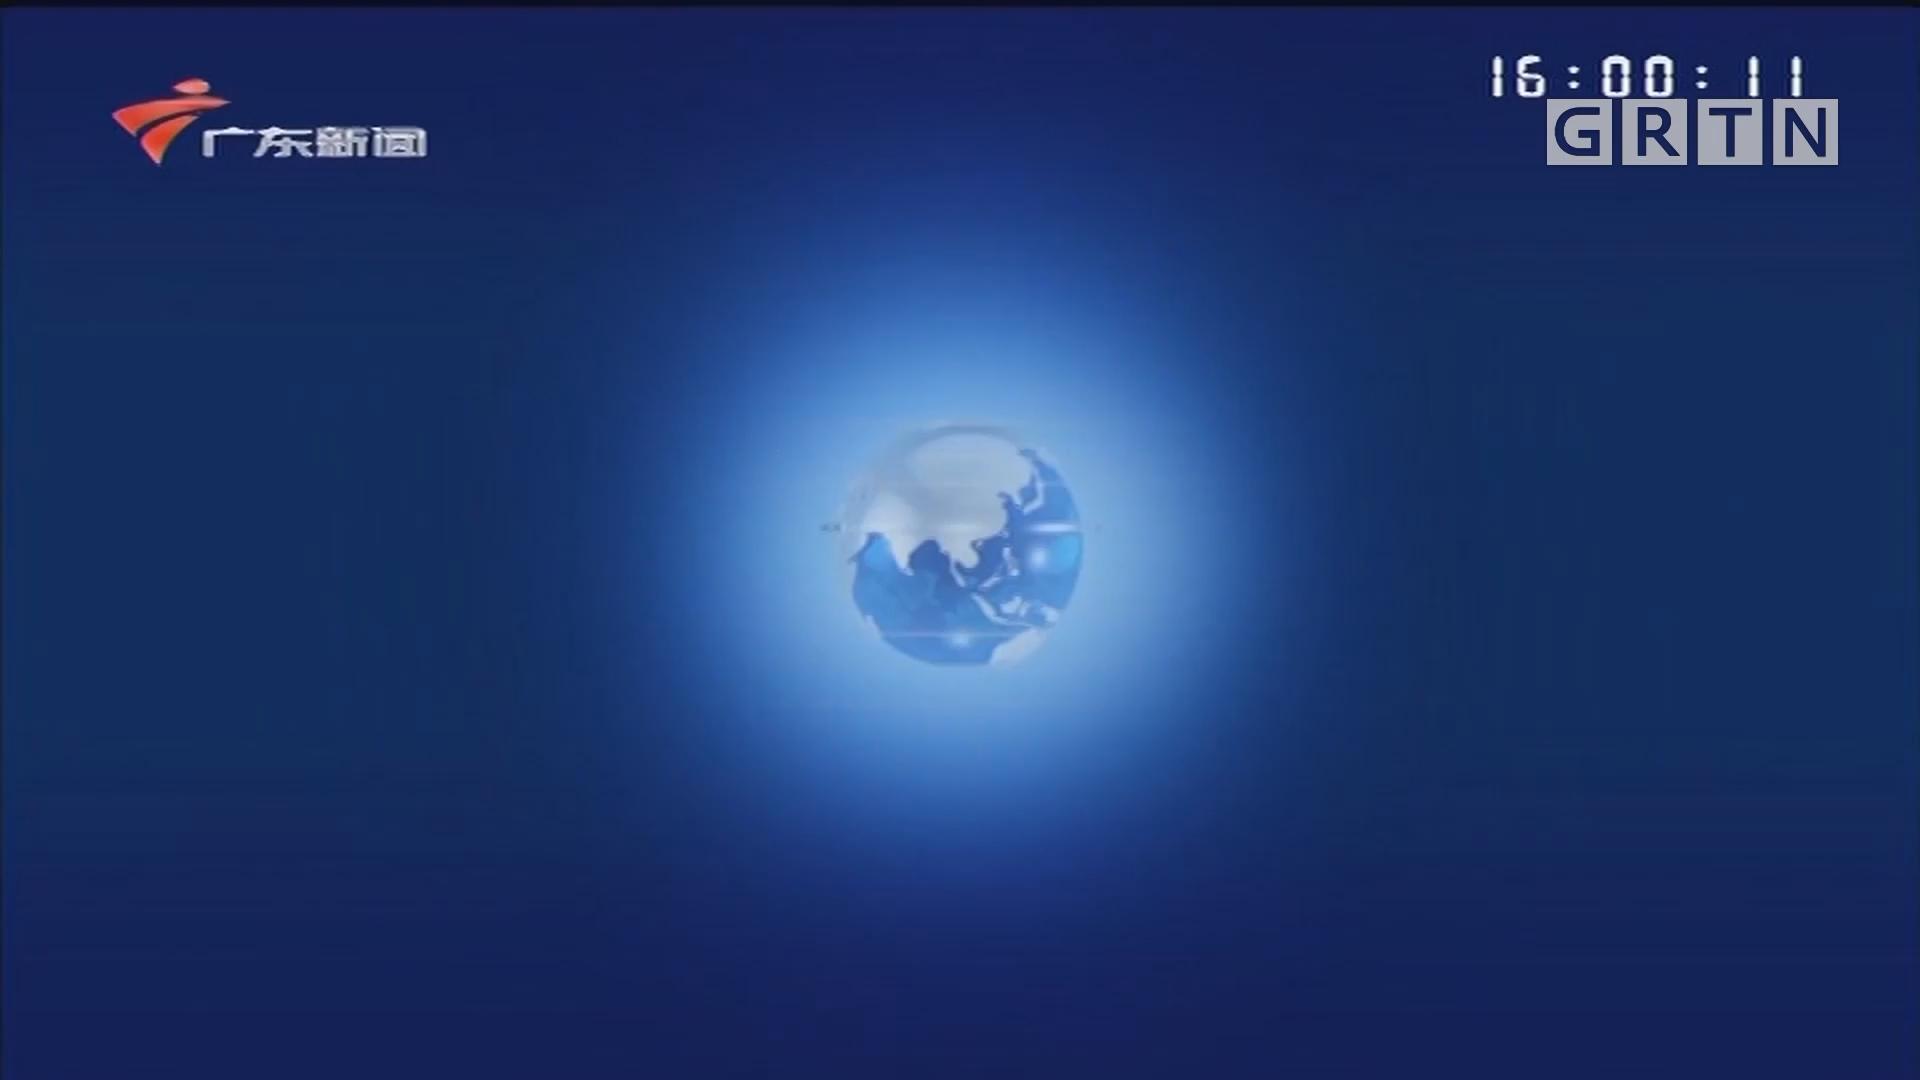 [HD][2020-02-11-16:00]正点播报:广东省政府举行疫情防控发布会